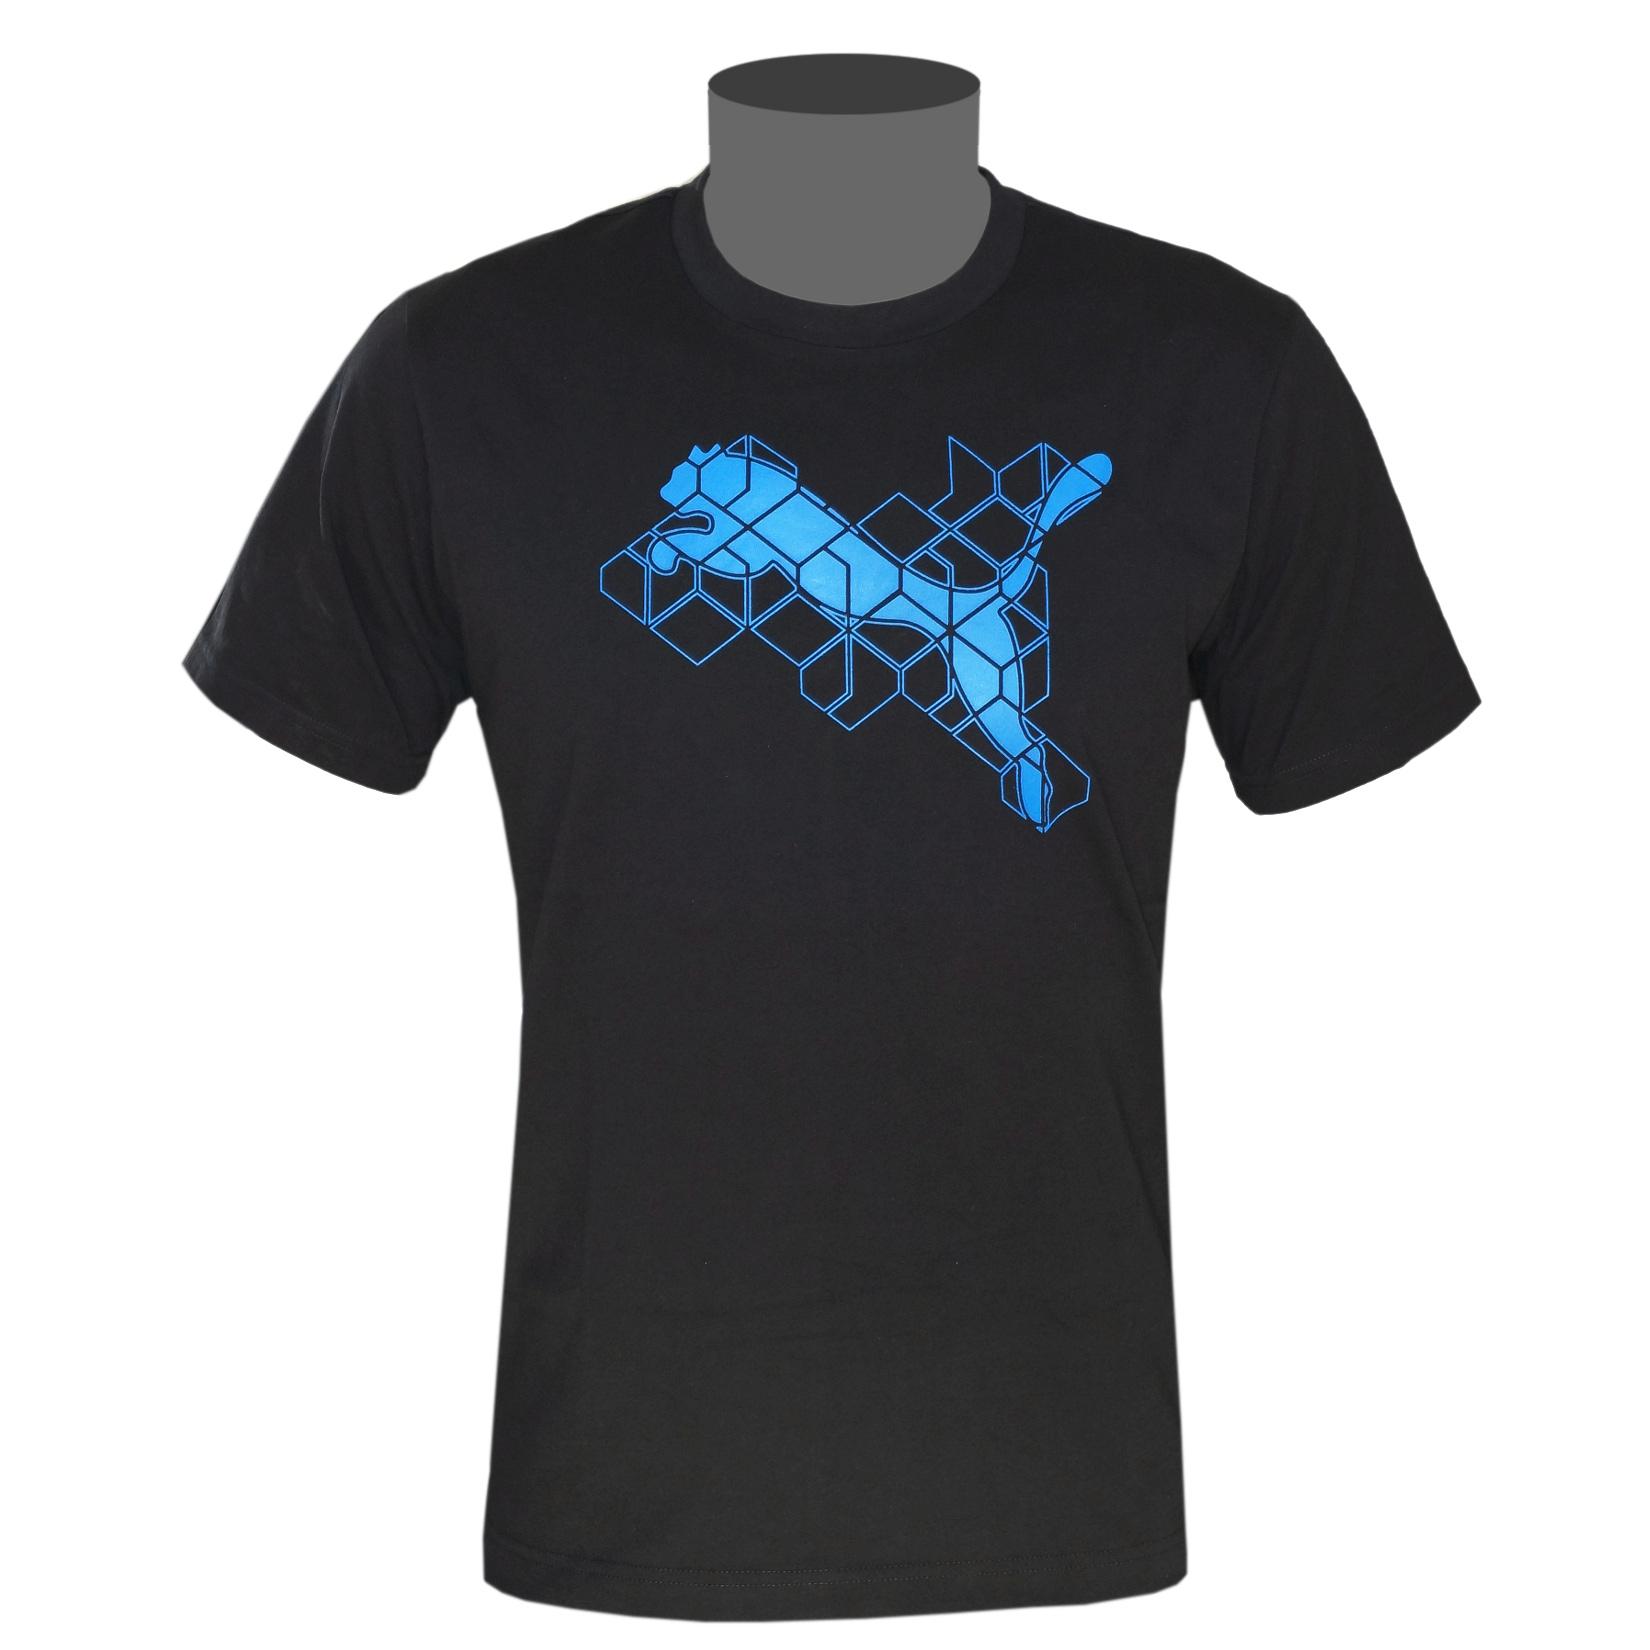 puma herren t shirt schwarz blau pure graphic cat ss tee logo ebay. Black Bedroom Furniture Sets. Home Design Ideas